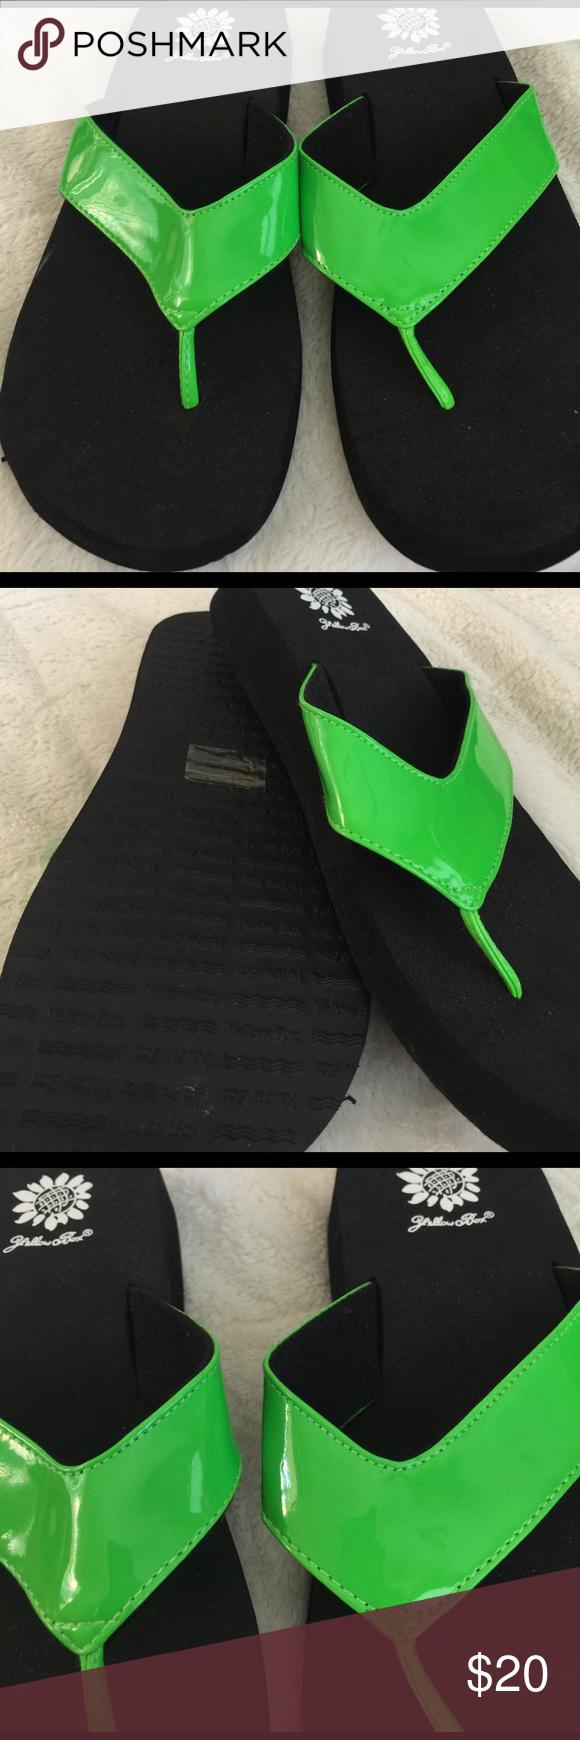 Yellow box size 9 flip flops brand new Yellow box size 9 flip flops brand new green Yellow Box Shoes Sandals